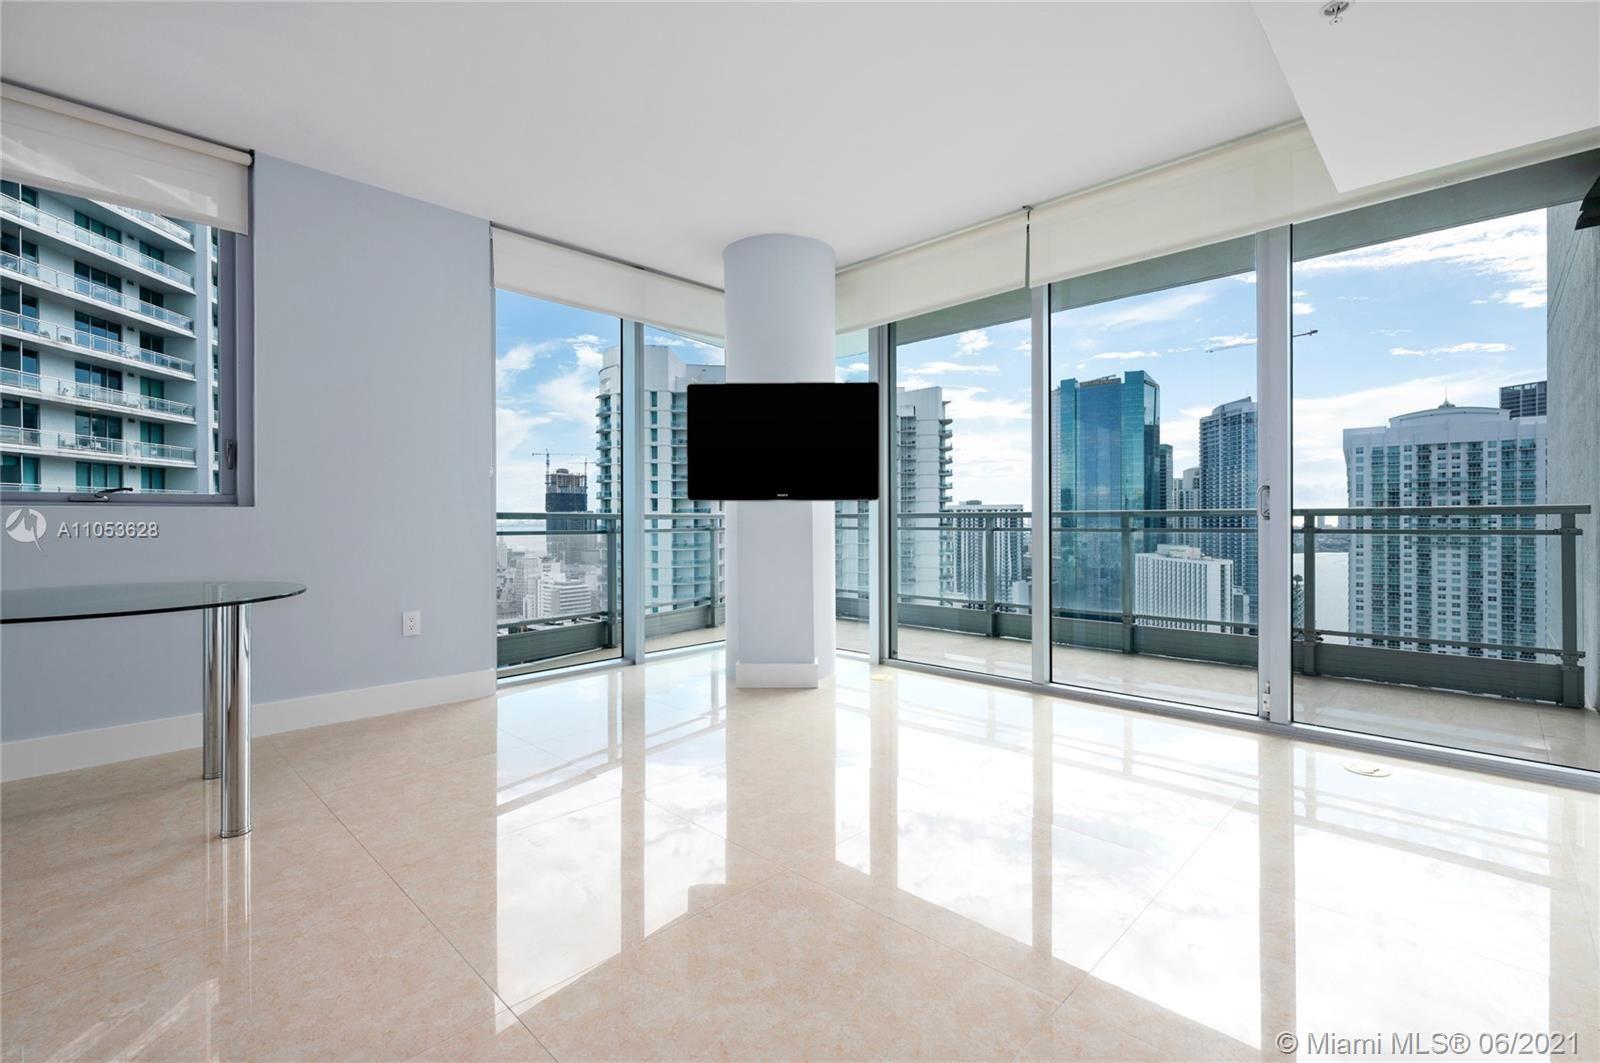 92 SW 3rd St #3510, Miami, FL 33130 - #: A11053628